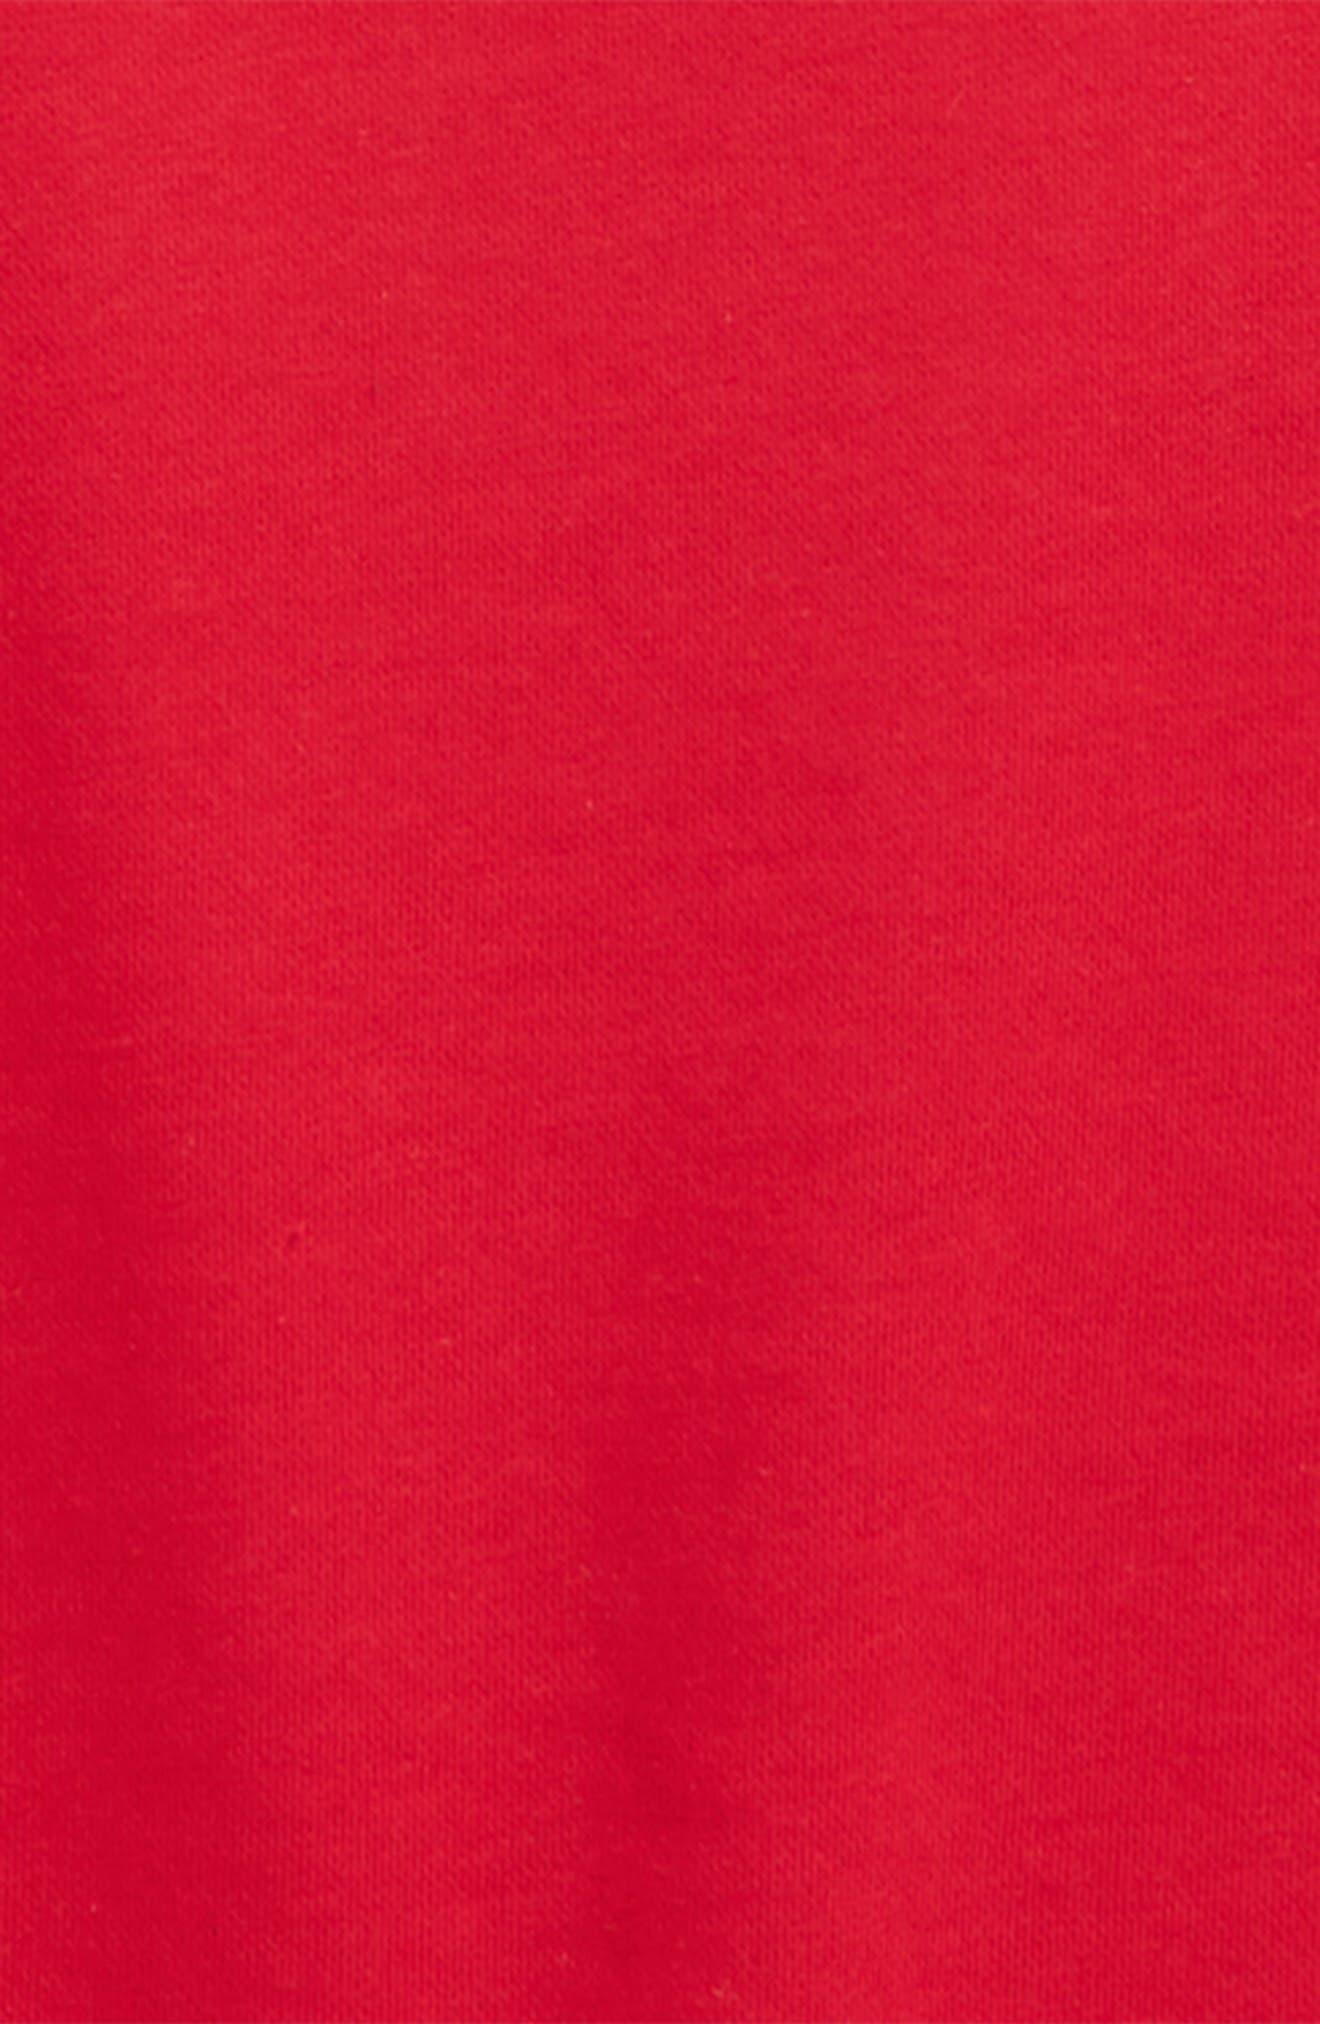 Lantern Sleeve Top,                             Alternate thumbnail 2, color,                             600